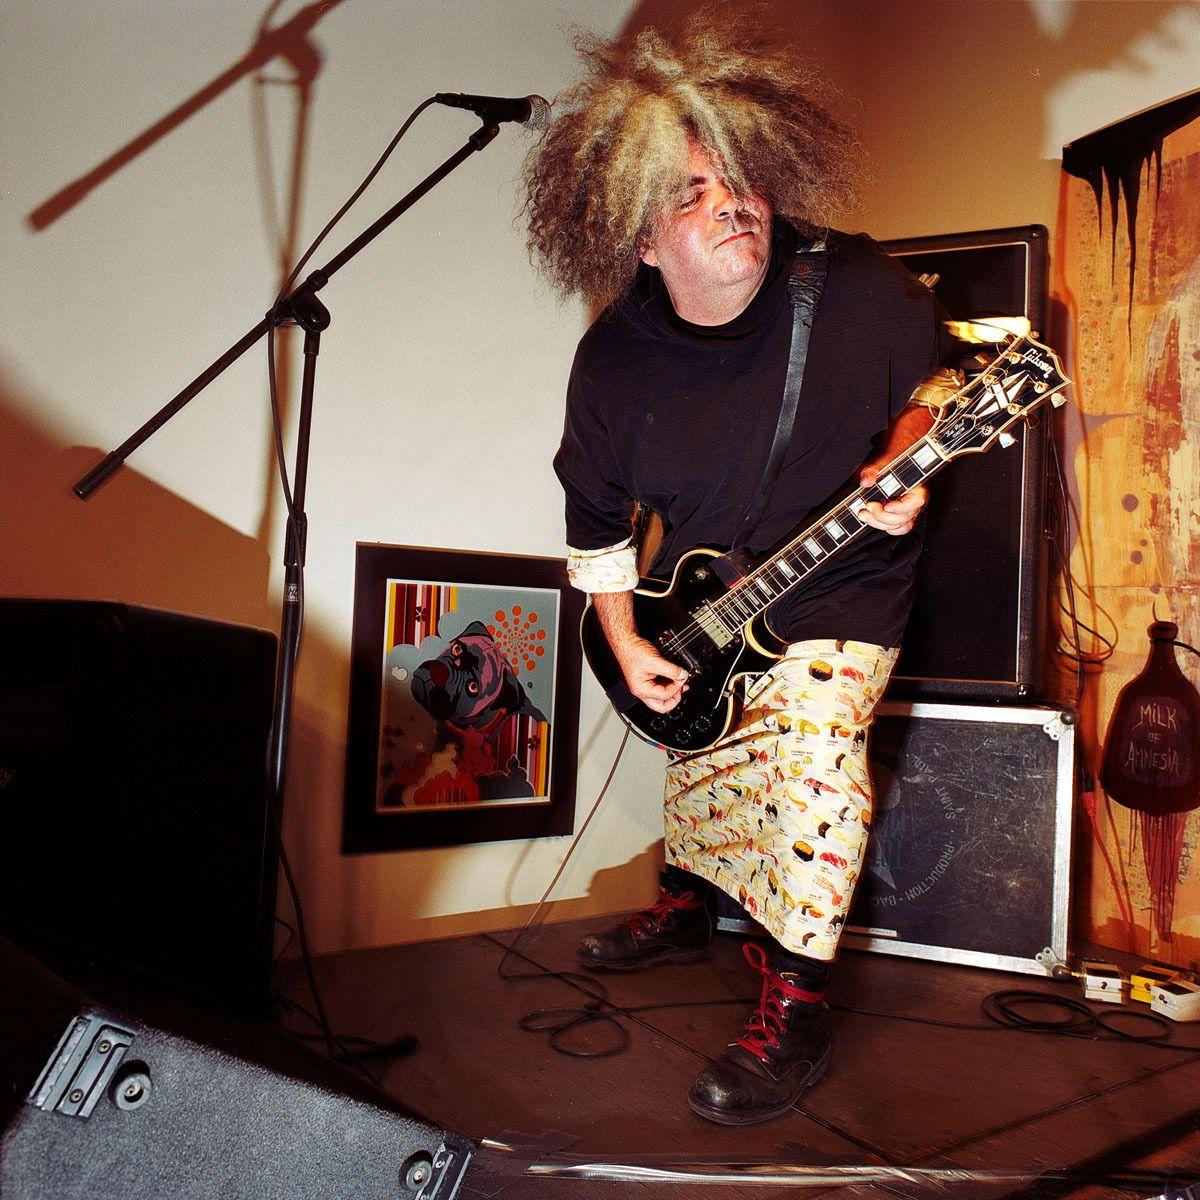 Melvins - (Buzz Osborne) - 2006 - Minneapolis, MN